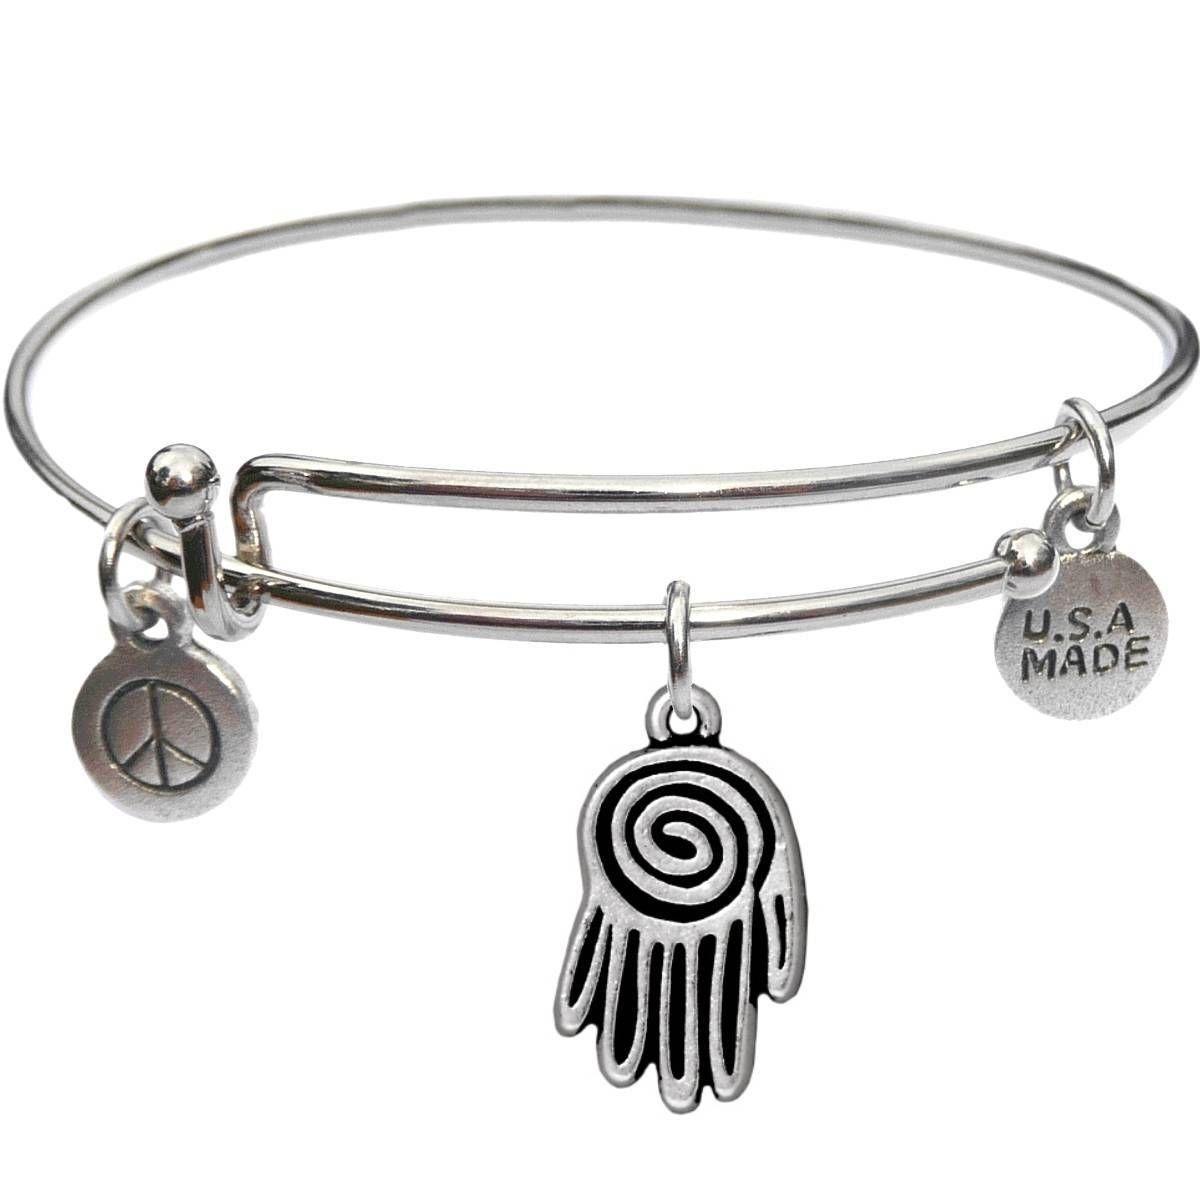 Bangle Bracelet and Spiral Hand - USA Made - BBandJT165